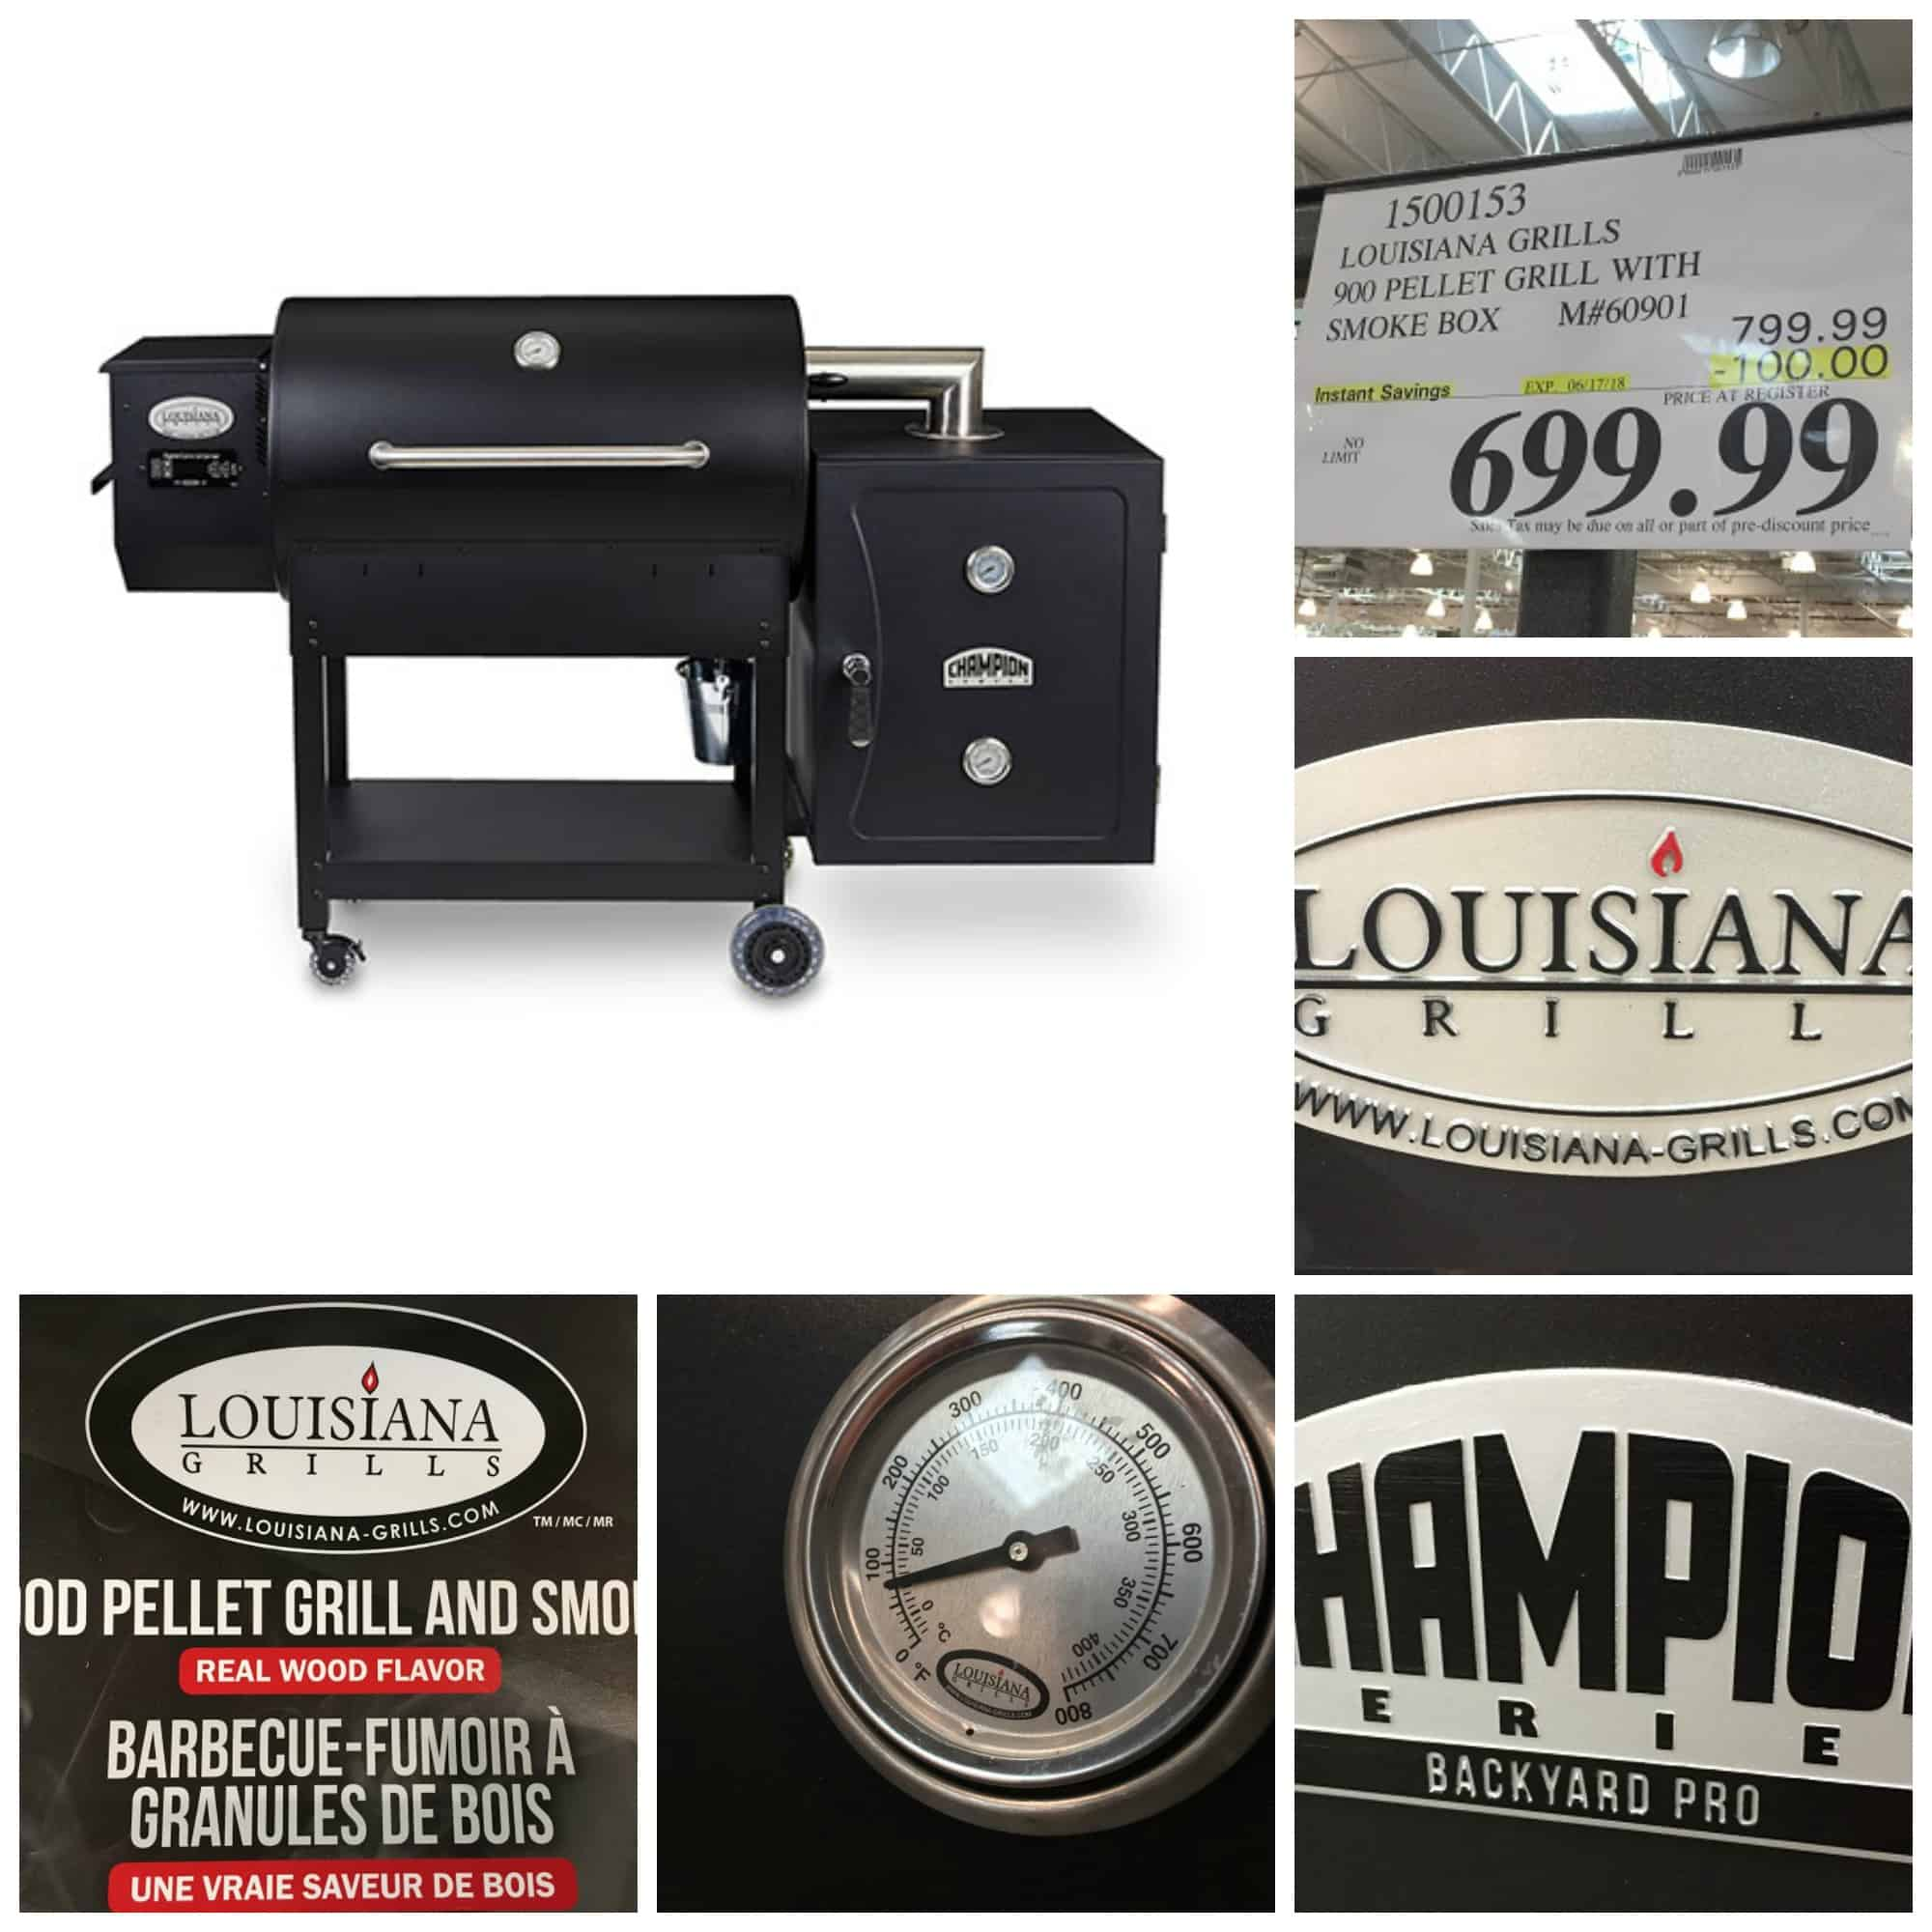 Louisiana Grills Champion Backyard Pro at Costco Review: I